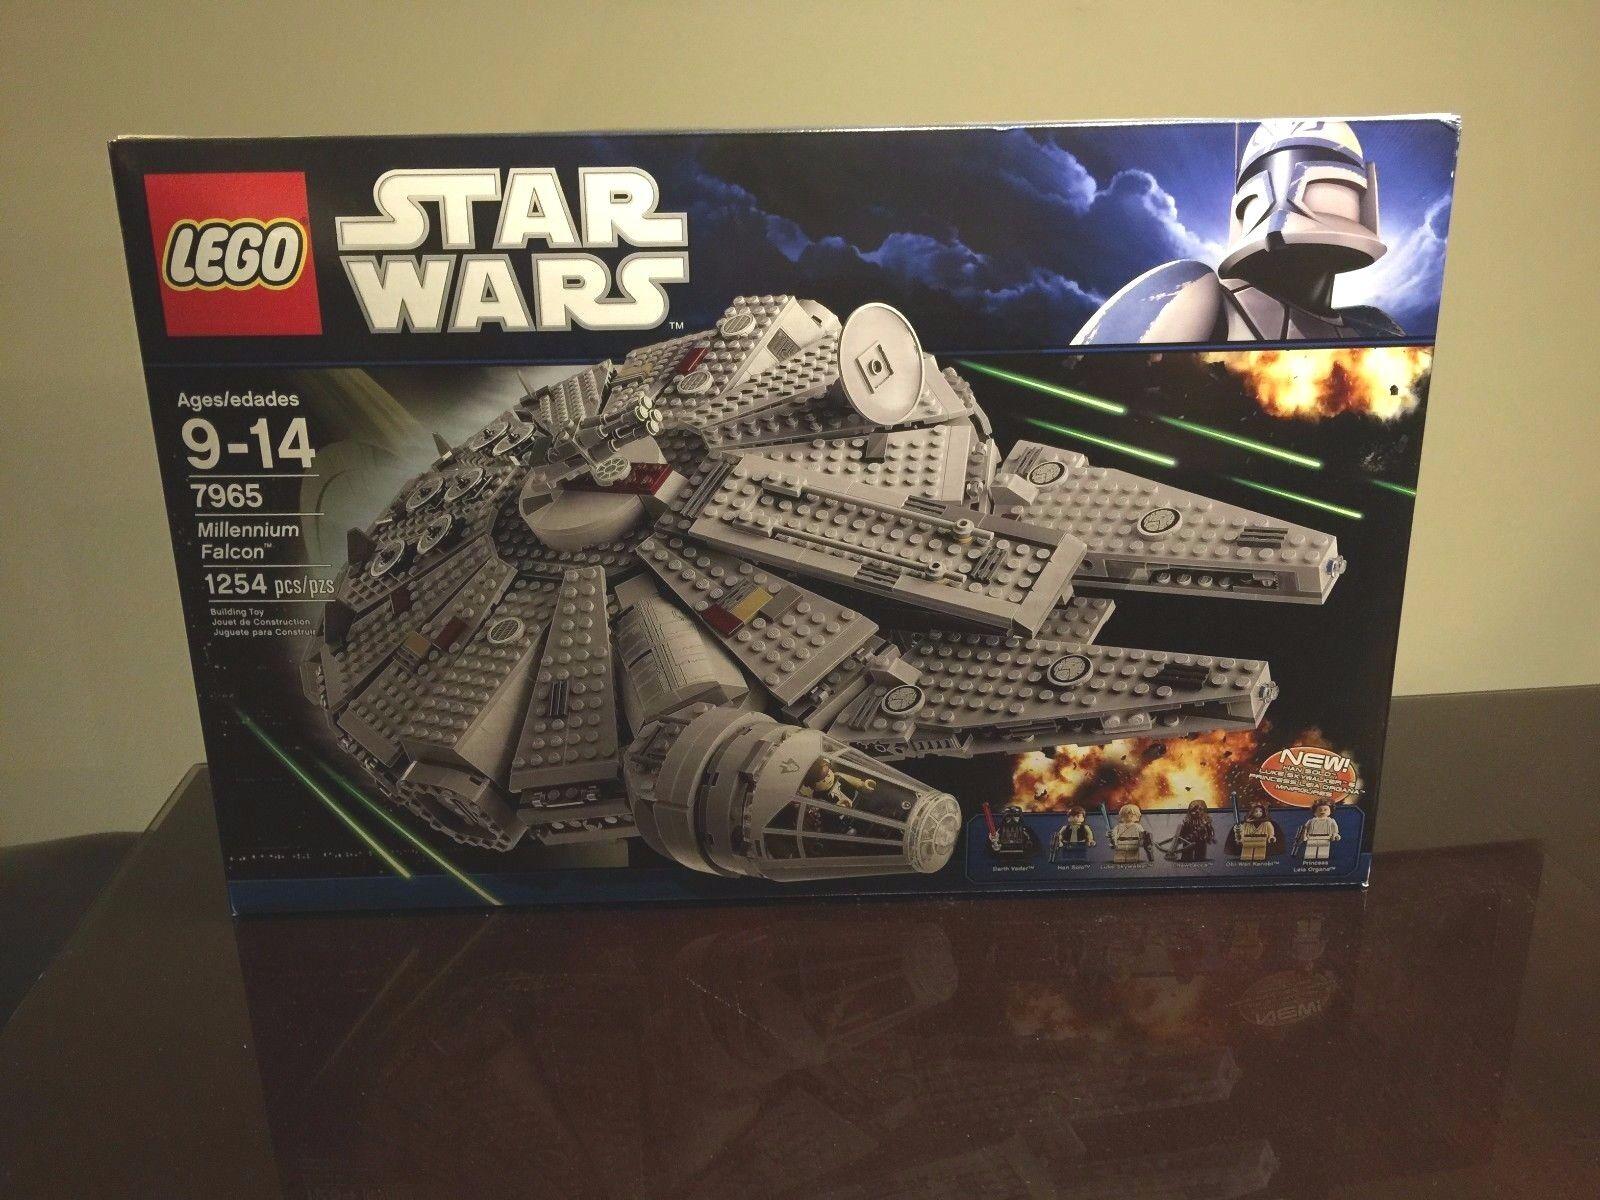 LEGO 7965 Millennium Falcon stjärnornas krig Set FacTORy SEALD and Retiröd